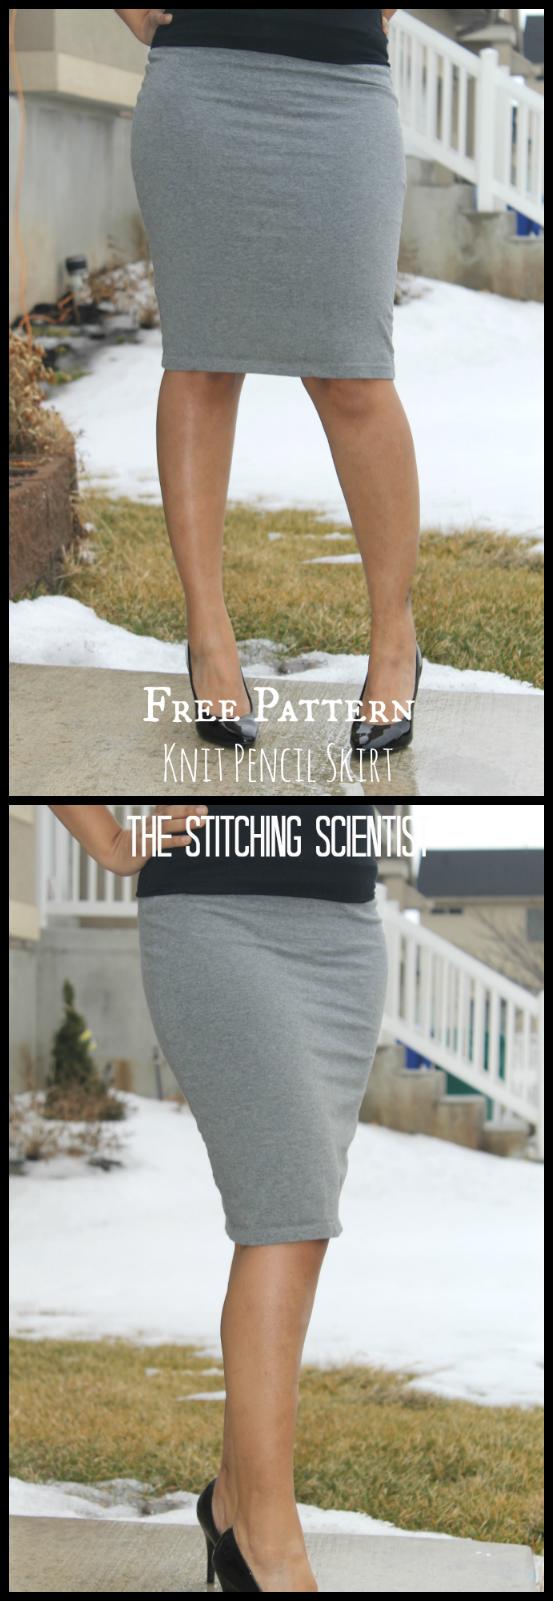 Free Skirt Patterns-Sexy Knit Pencil Skirt